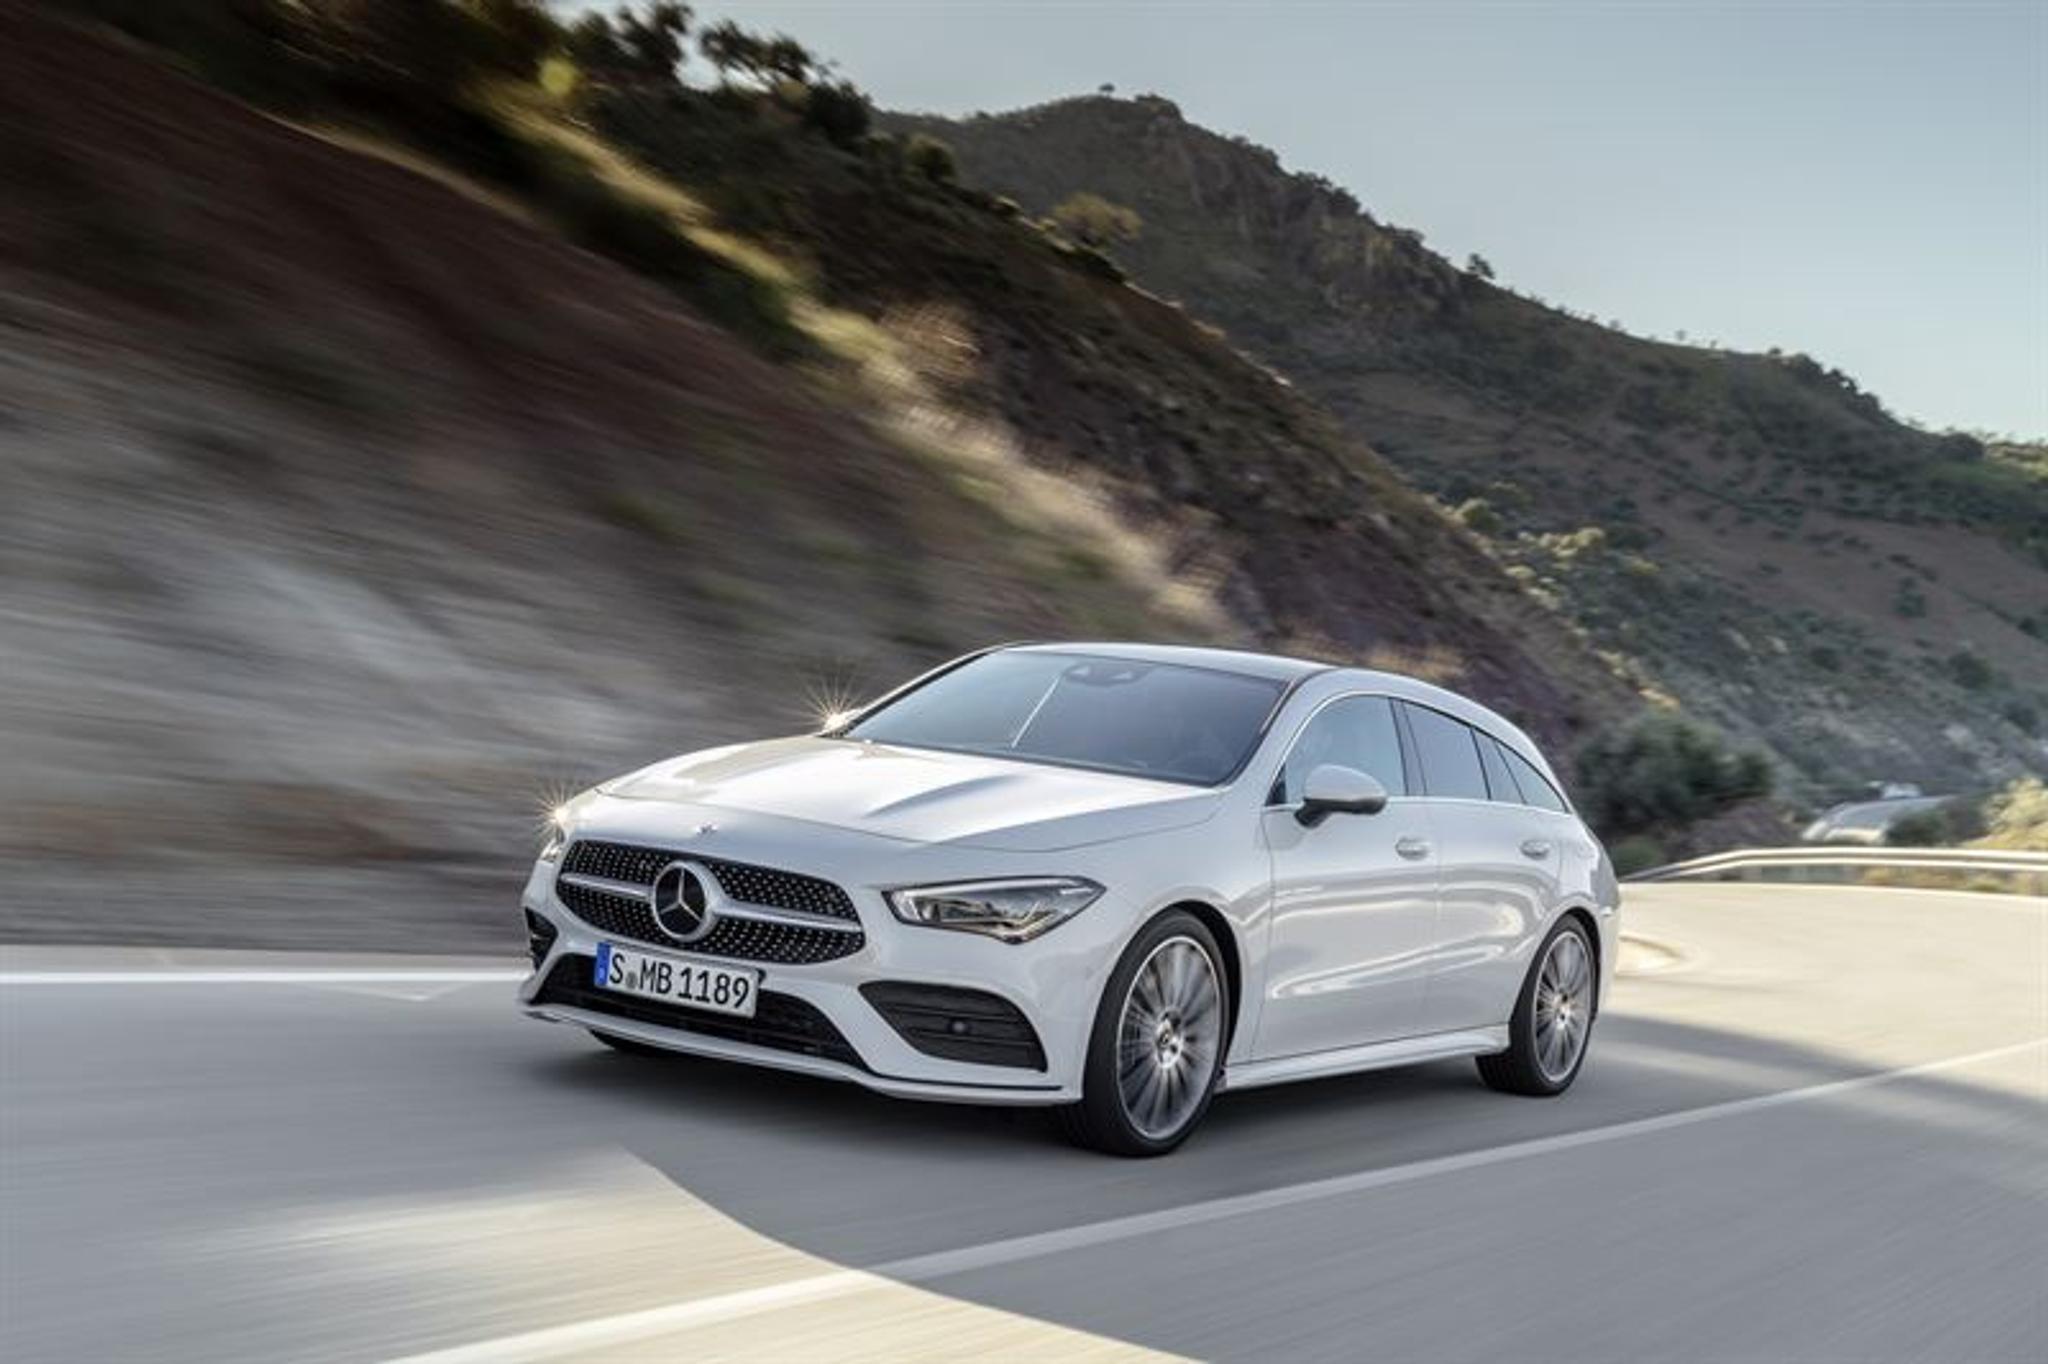 Cla Shooting Brake >> Tassa On Mercedes Benzin Uusi Cla Shooting Brake Tuulilasi